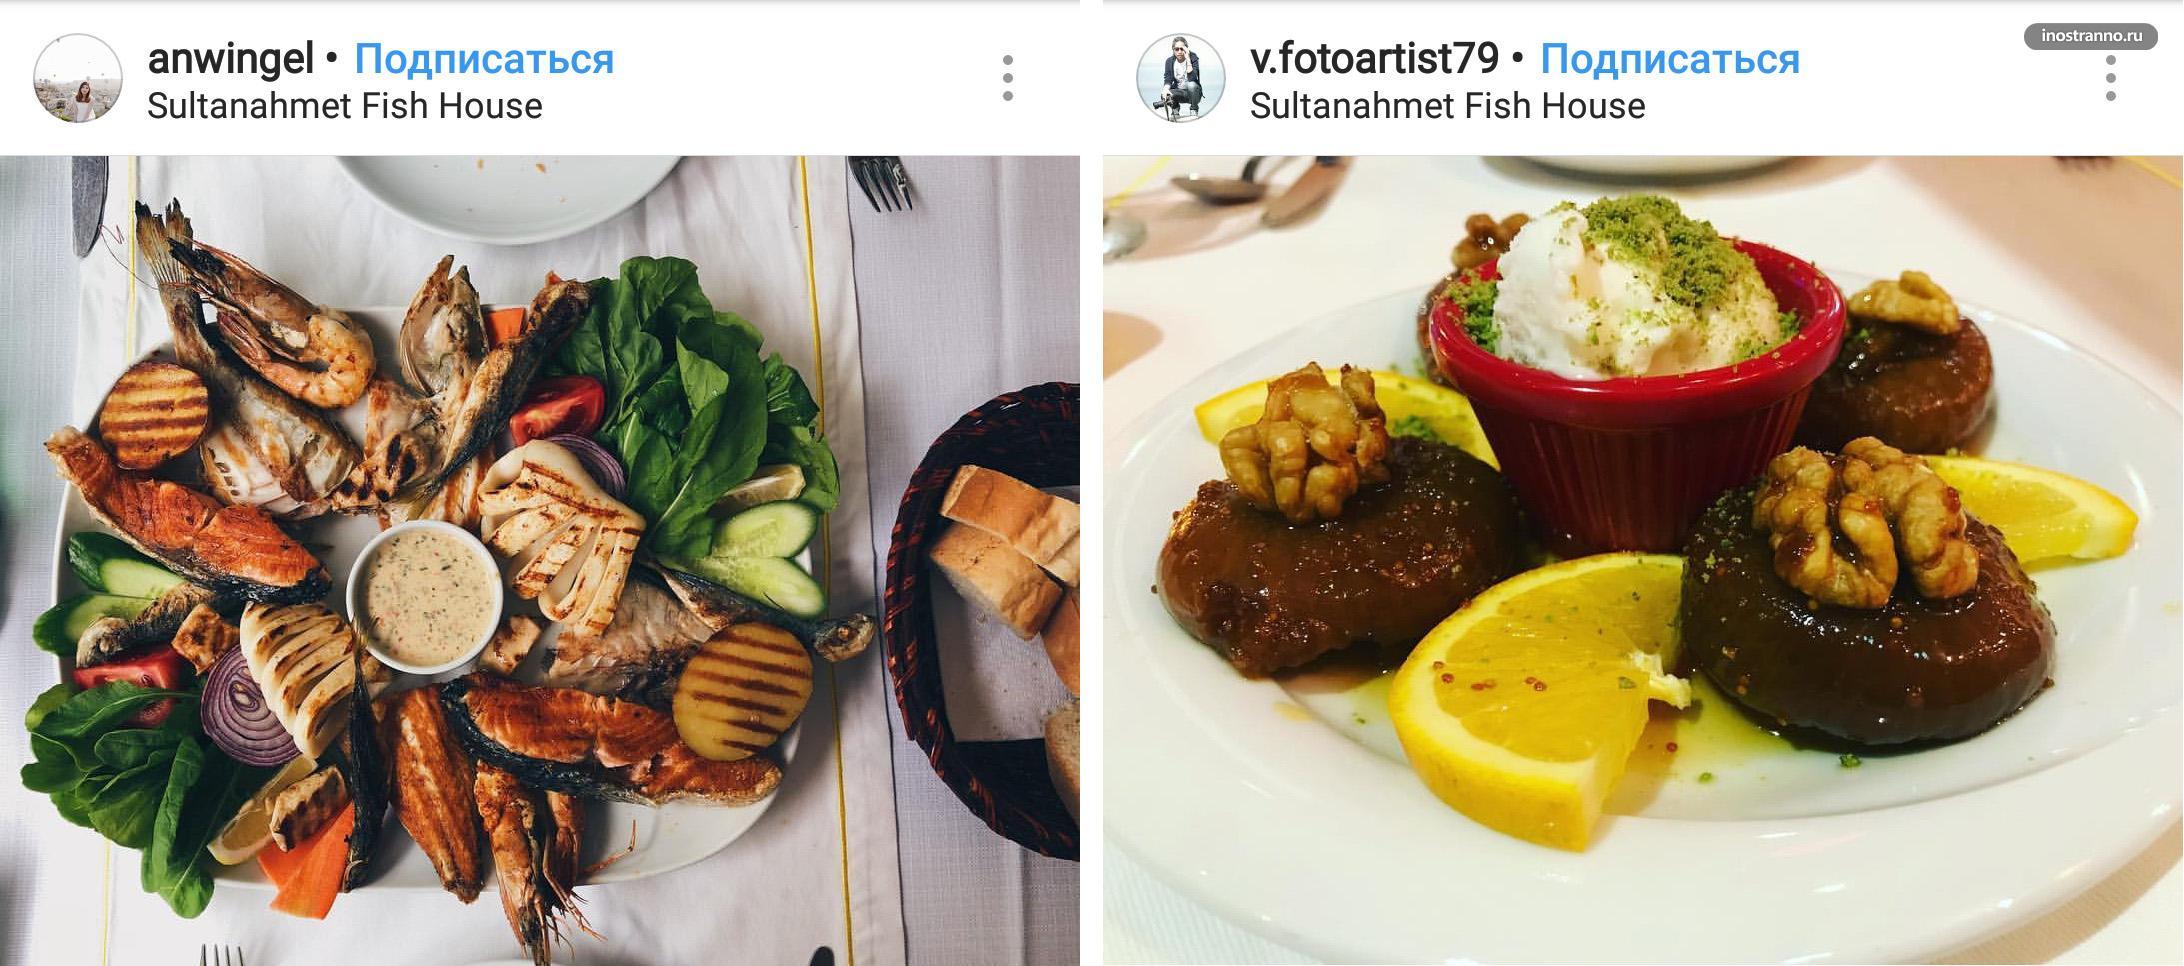 Sultanahmet Fish House ресторан с морепродуктами в Стамбуле